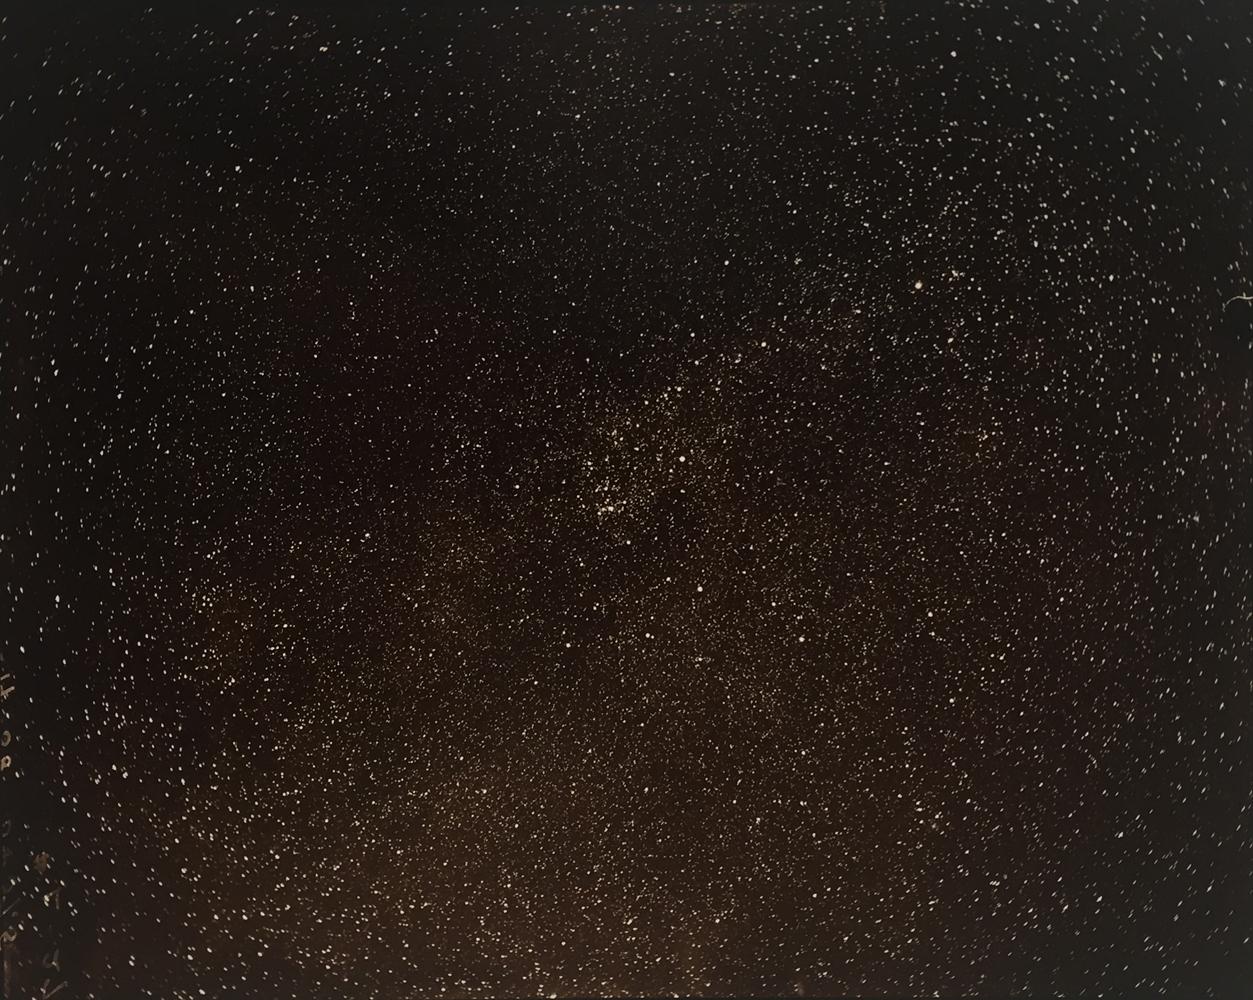 Linda Connor, Lick Observatory Plate Archive, Mt. Hamilton, UC Santa Cruz, 1892/1996, gold toned print, 8 x 10 inches